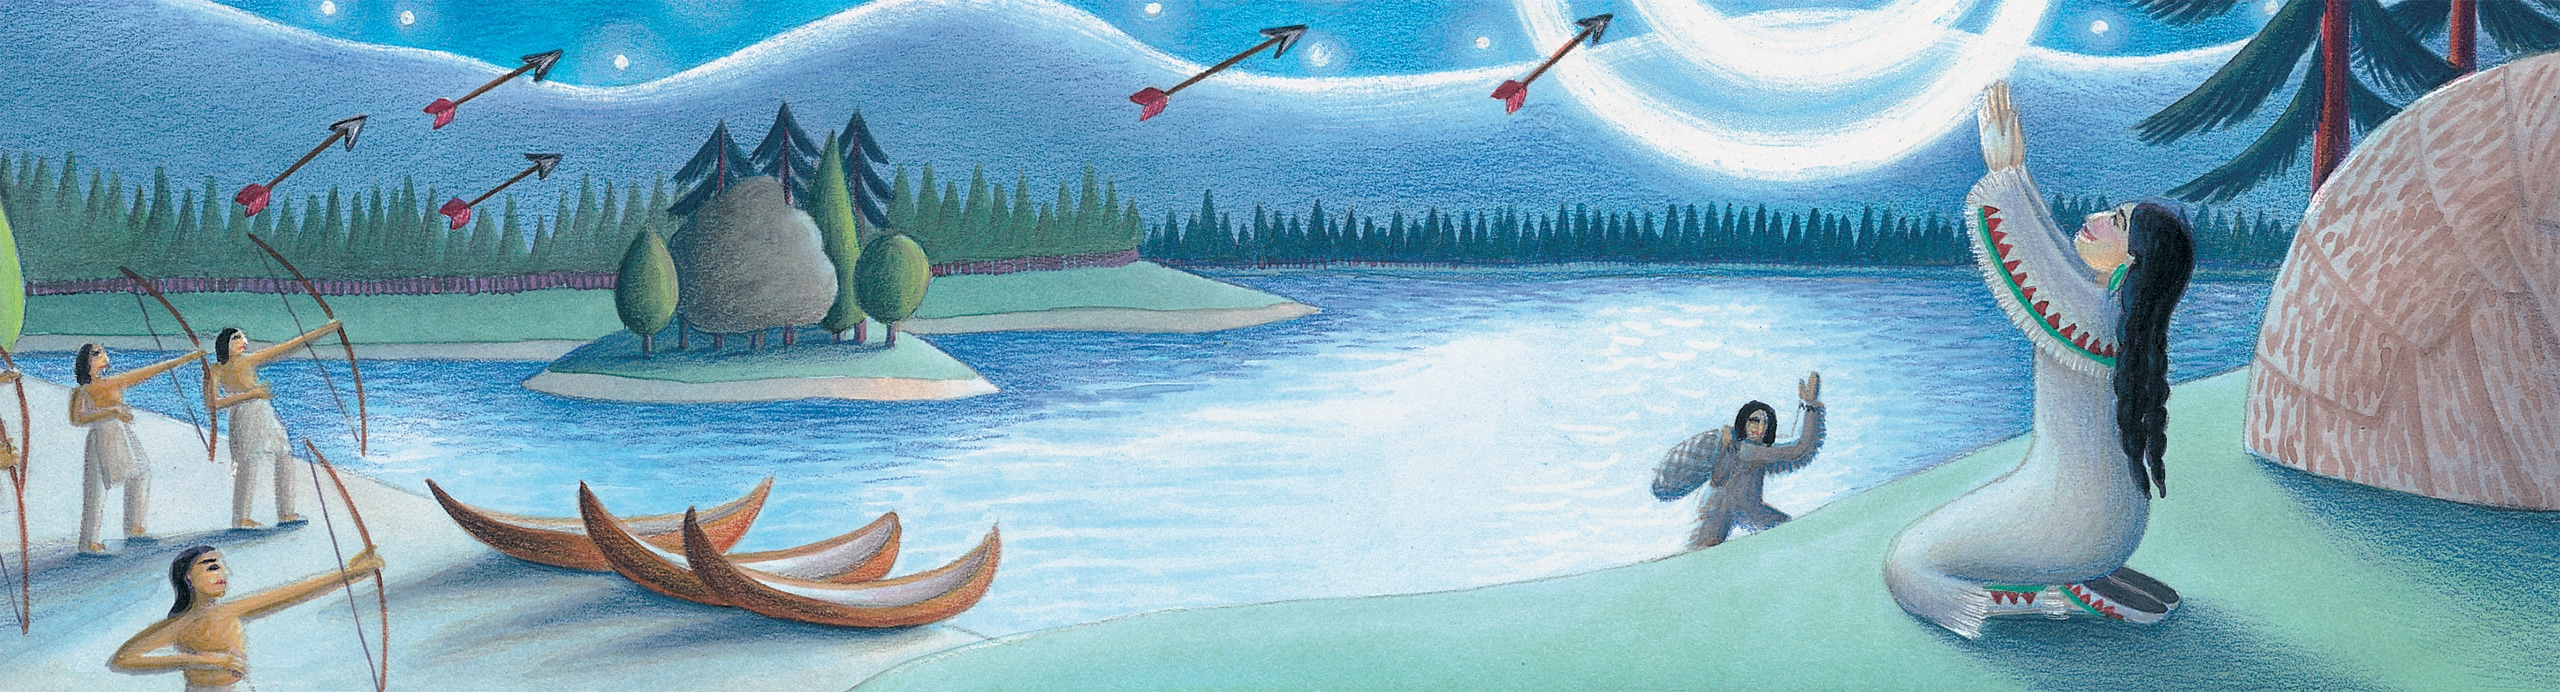 Illustrations for Children's Picture Books 'Banner Image'